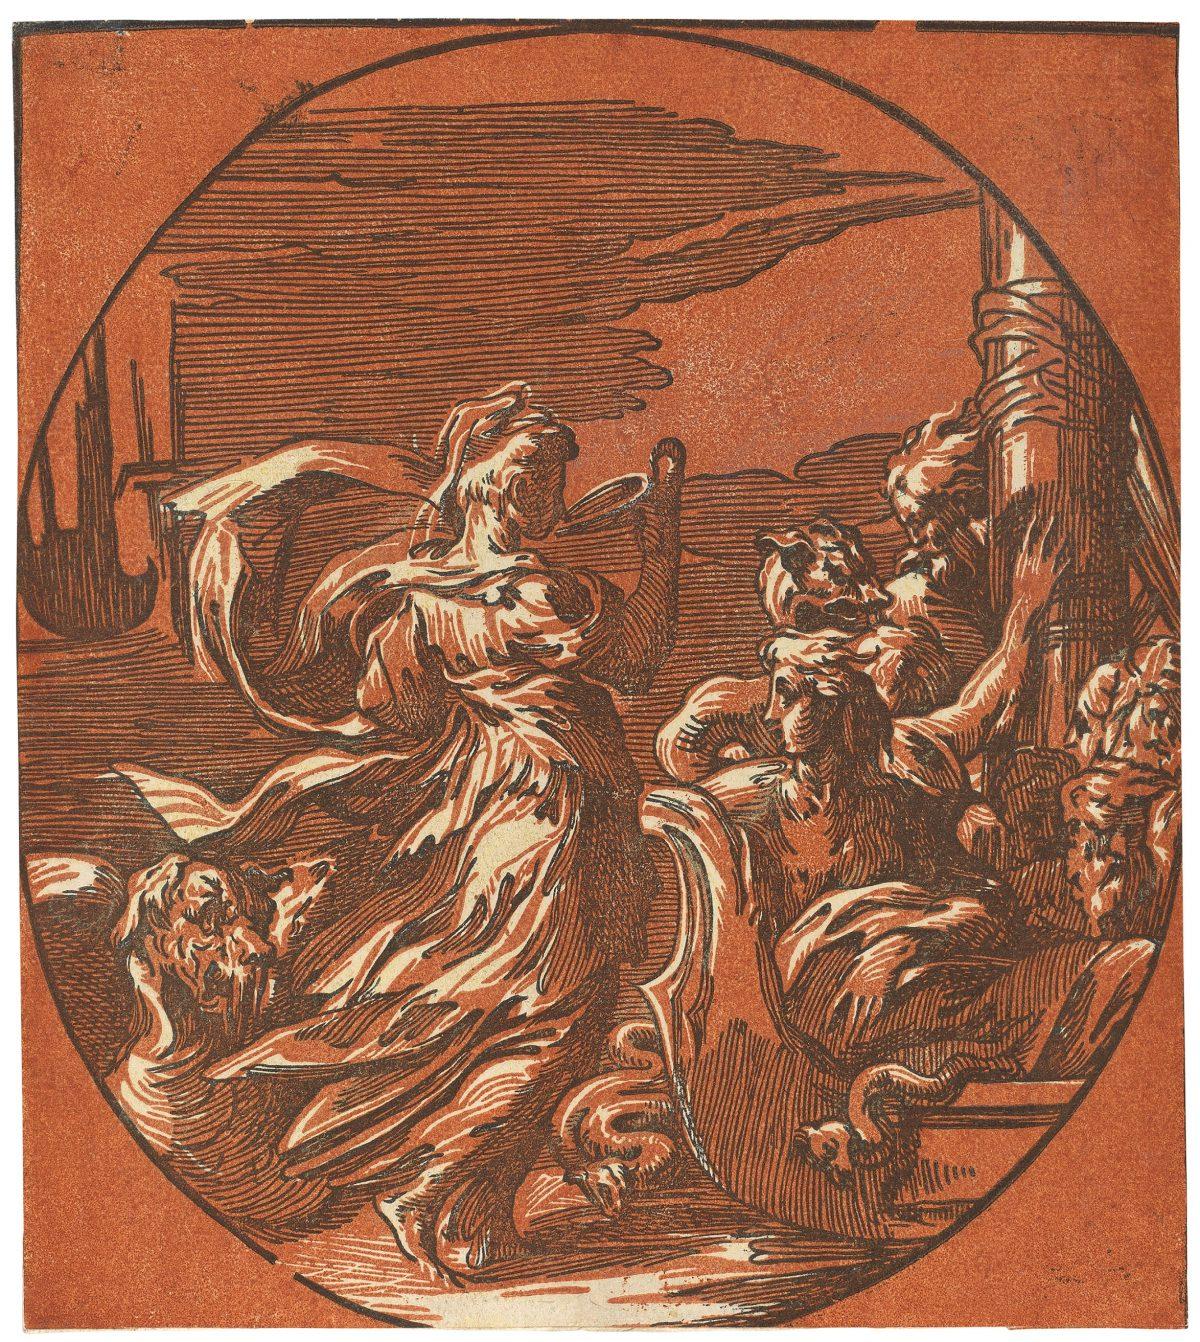 Circe lady drinking myth